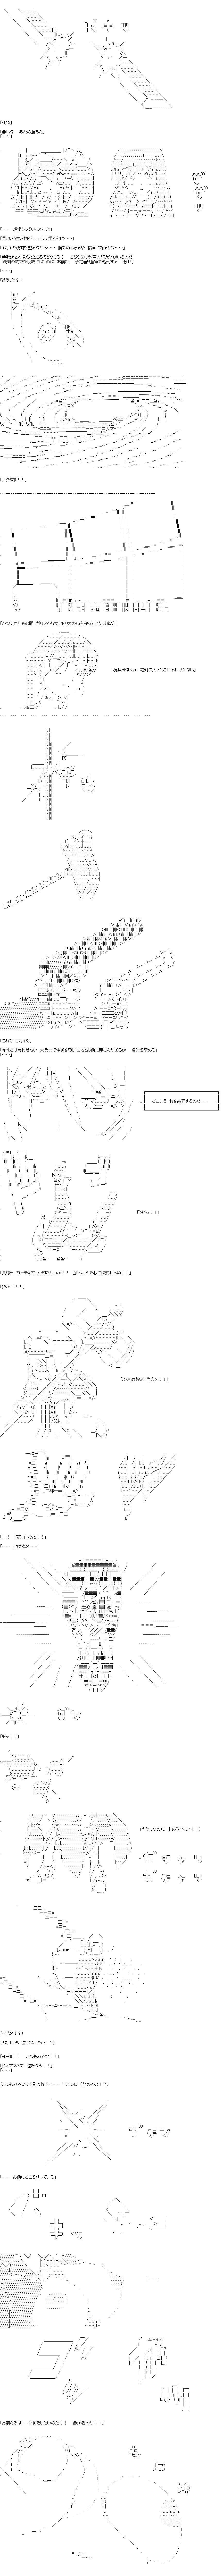 f:id:bottle512:20200217230732p:plain